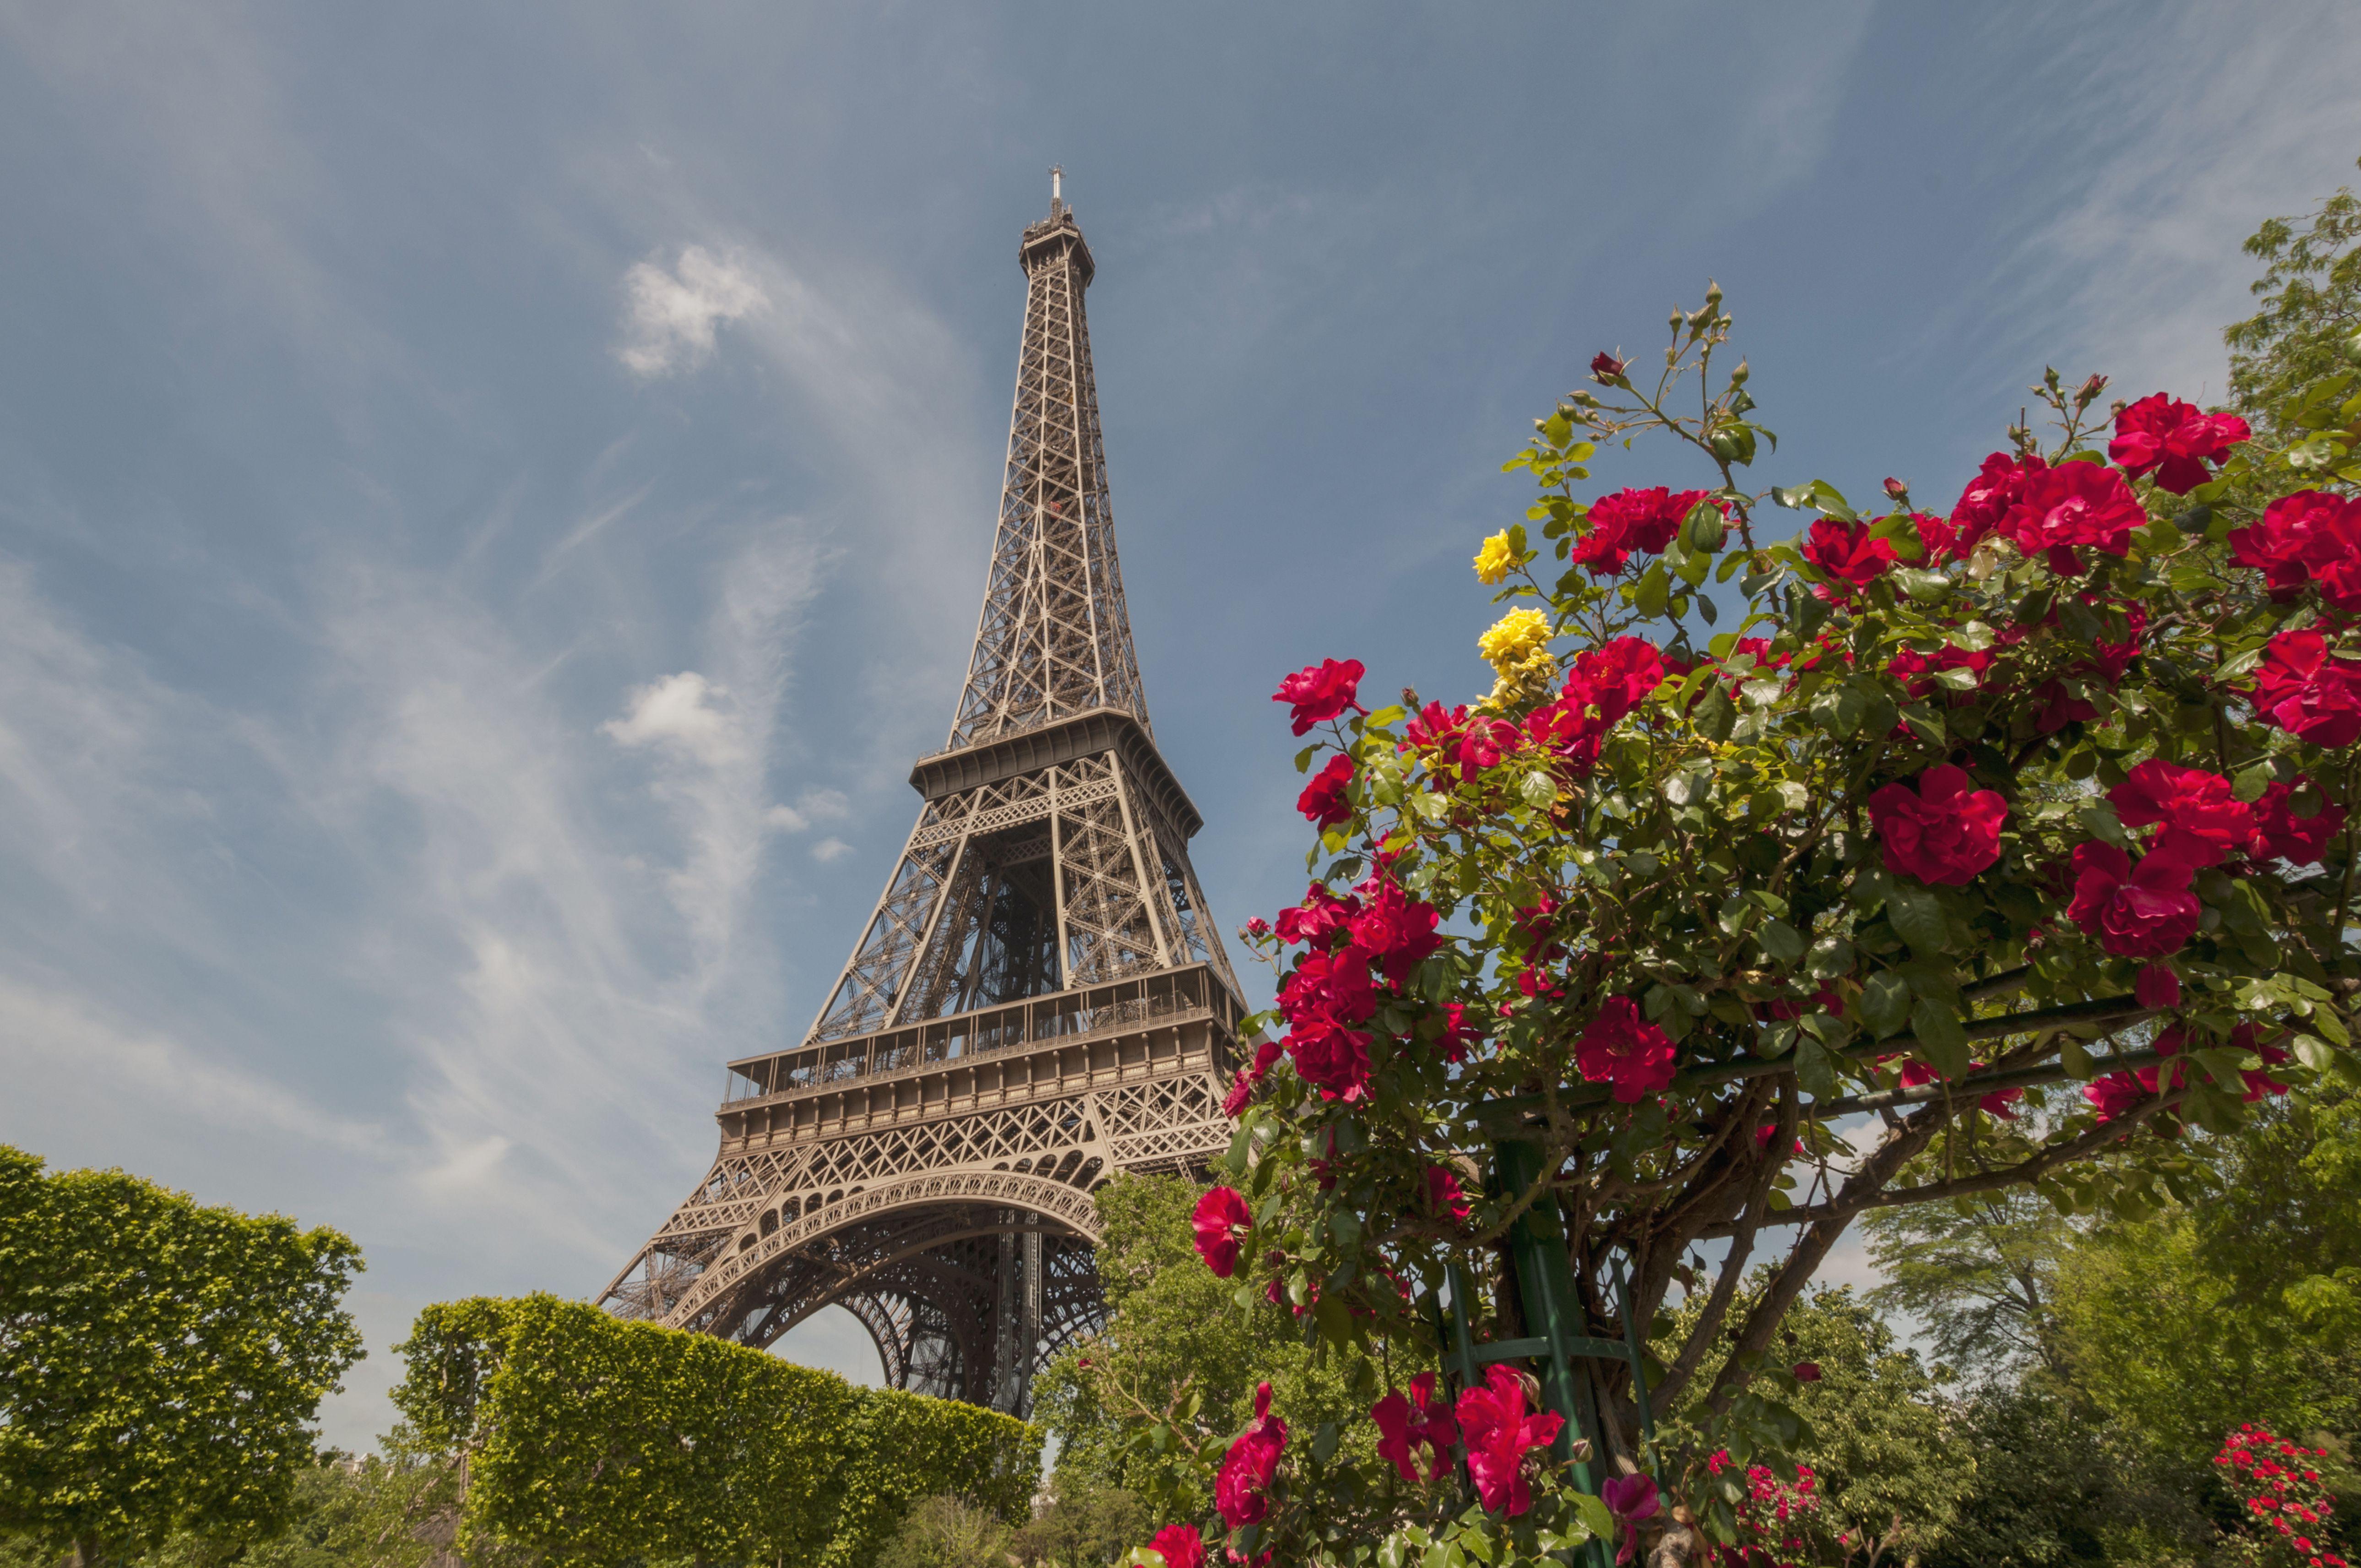 Eiffel Tower, iron lattice, Champ de Mars in Paris, design by Gustave Eiffel, 1889 World's Fair